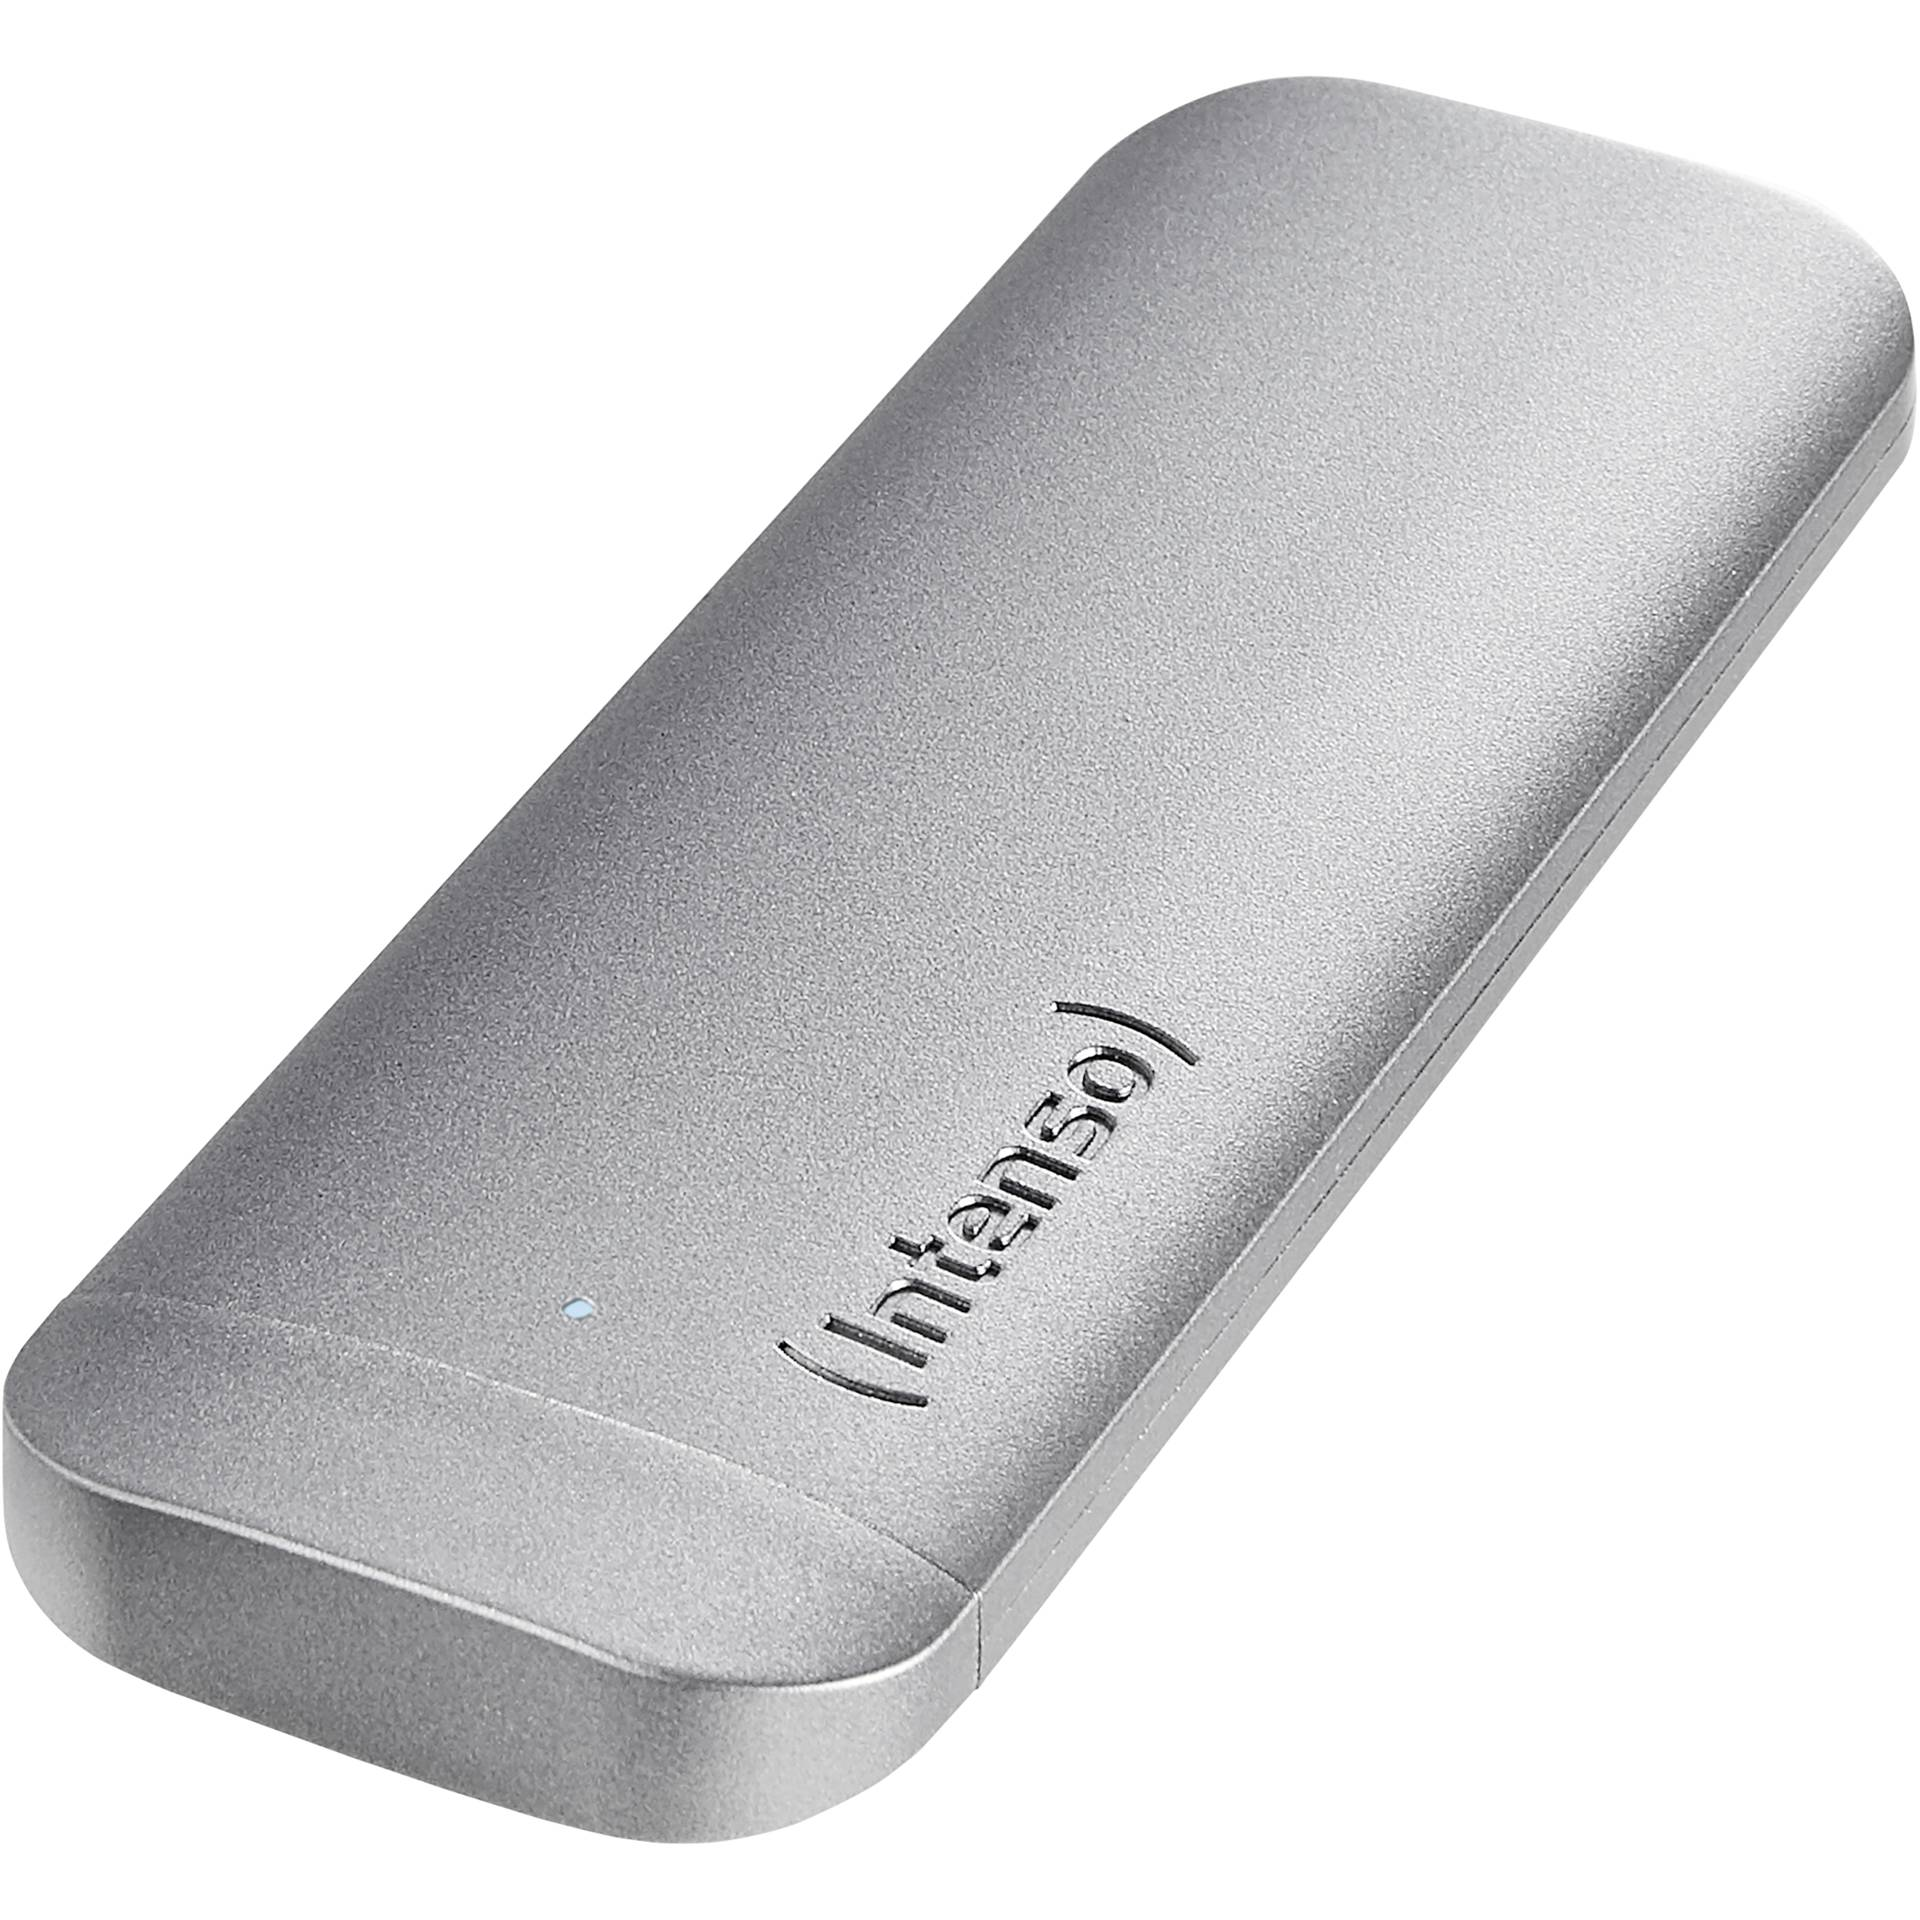 Intenso externe SSD 250GB USB 3.1 Gen.1 Type C Business